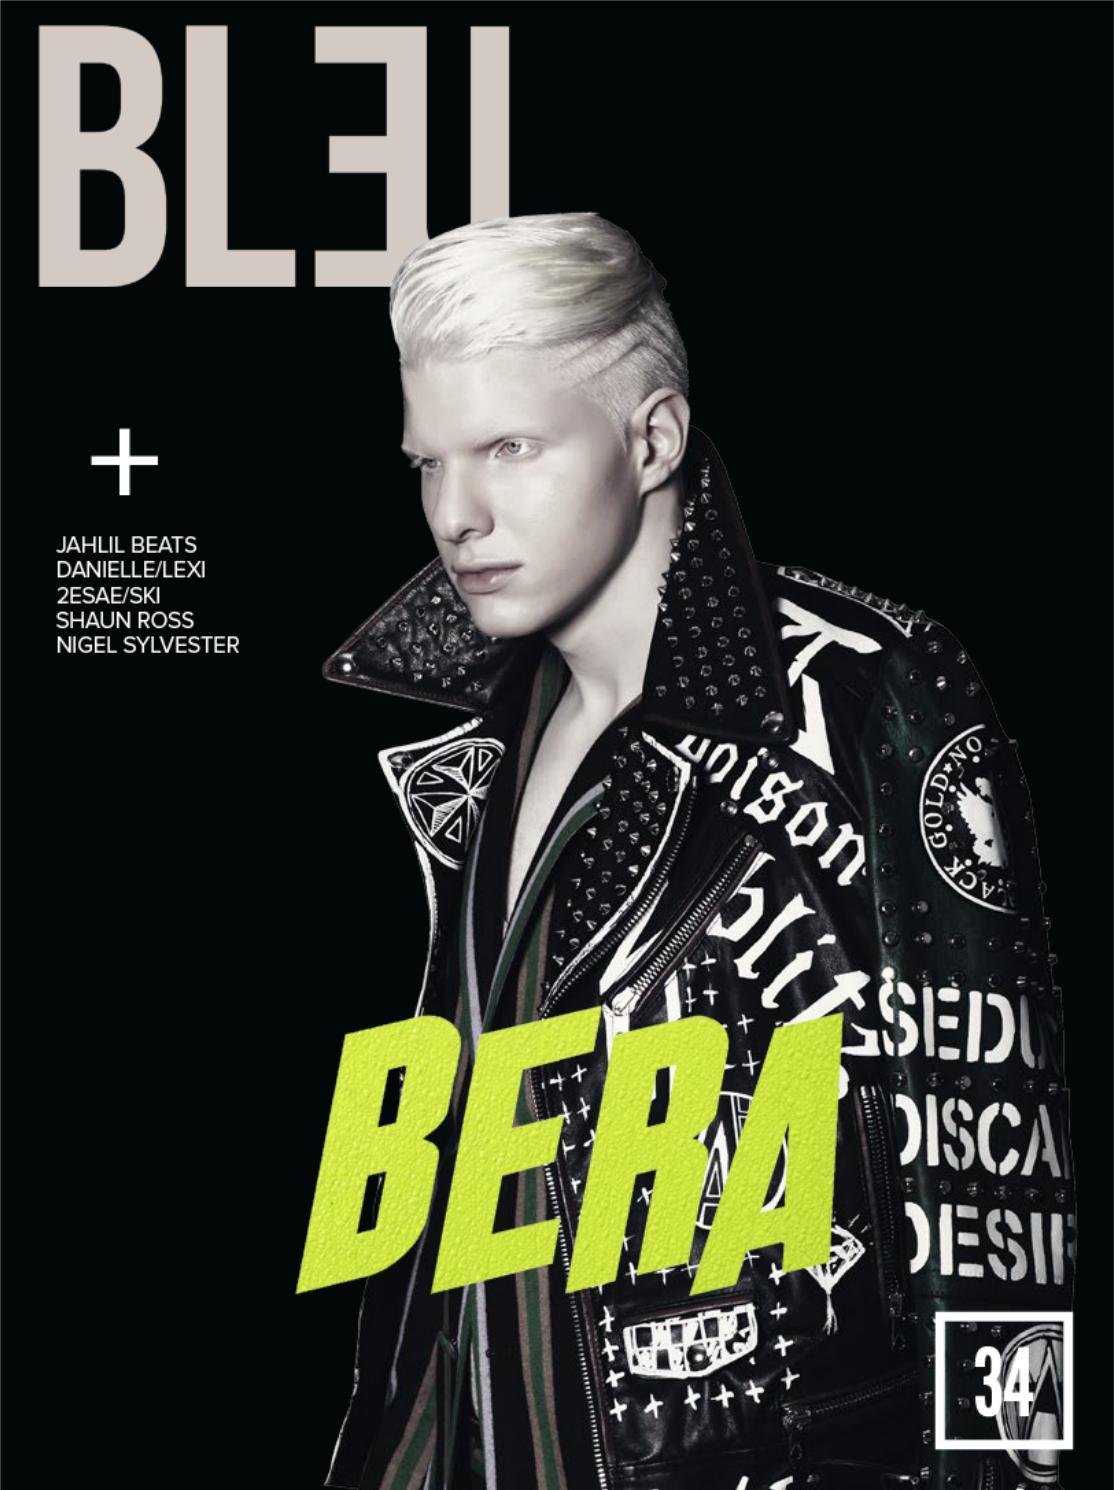 bde64edaafc64 Bleu Magazine Issue 34- Bera by Bleu Magazine - issuu